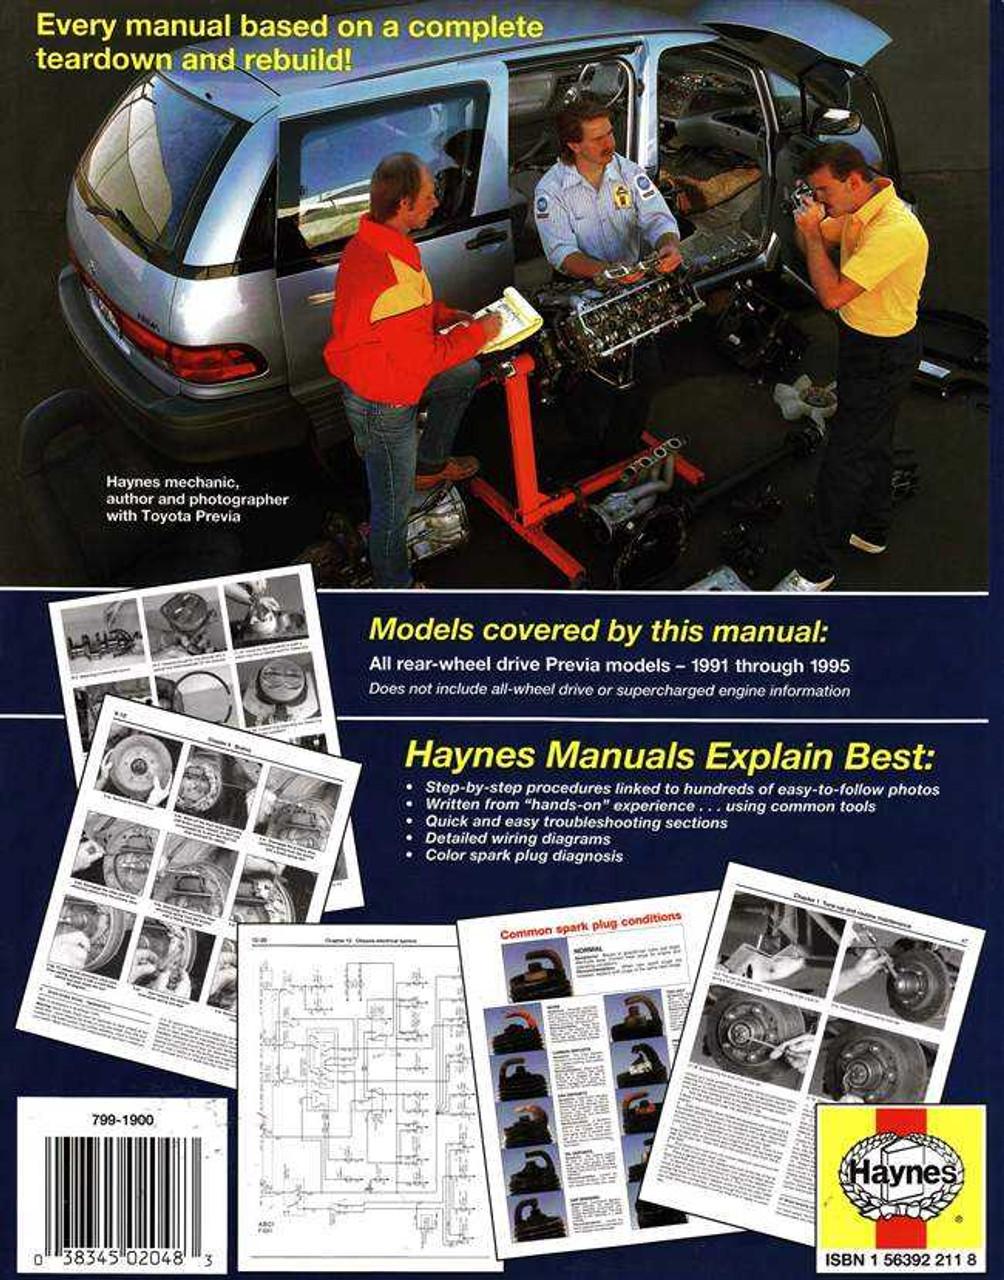 Toyota Tarago (Previa) 1991 - 1995 Workshop Manual